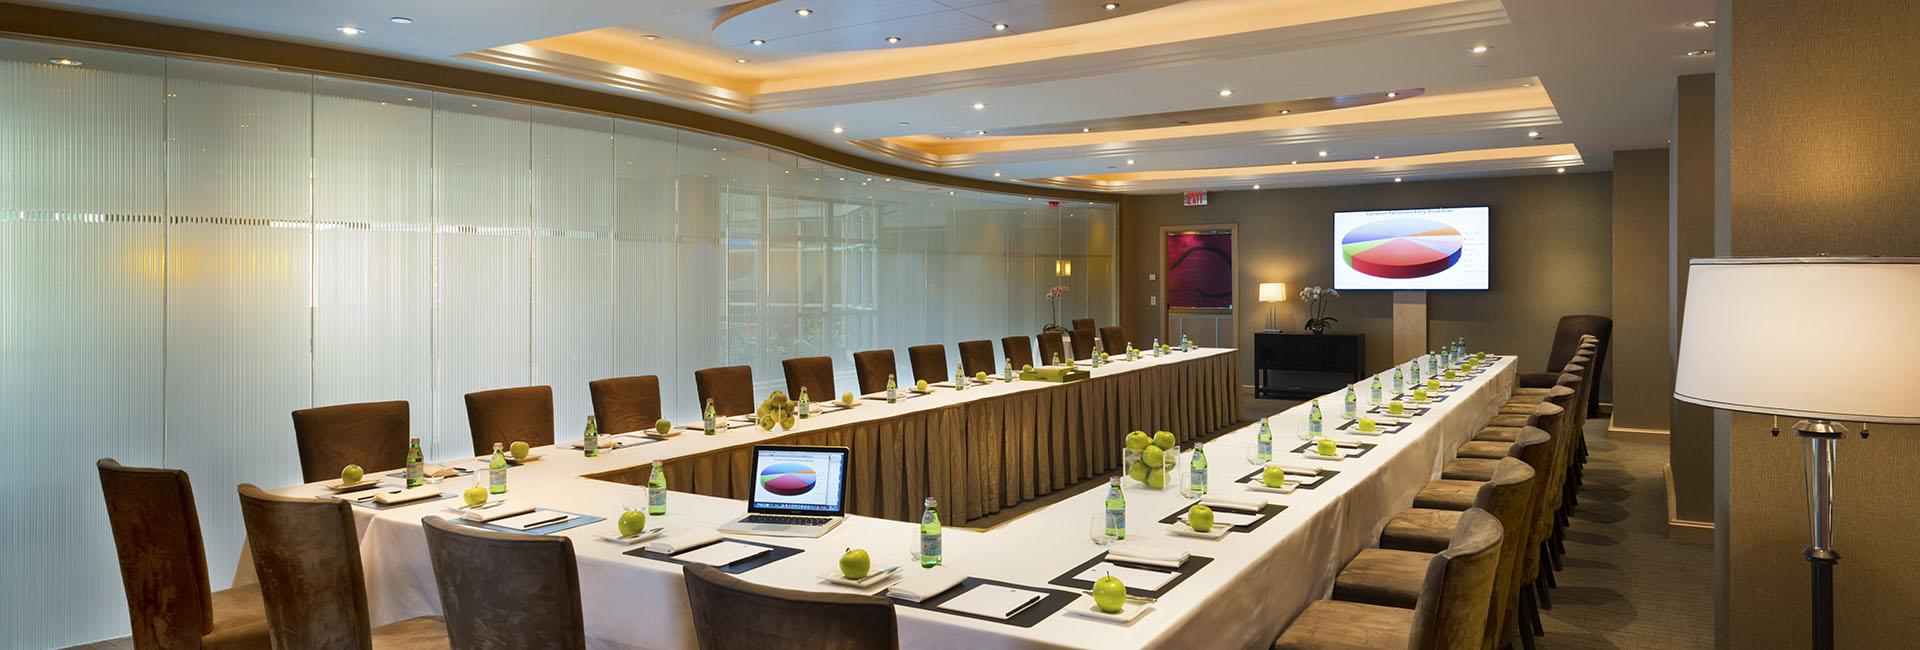 Meetings Parties Event Catering Soho Metropolitan Hotel Toronto